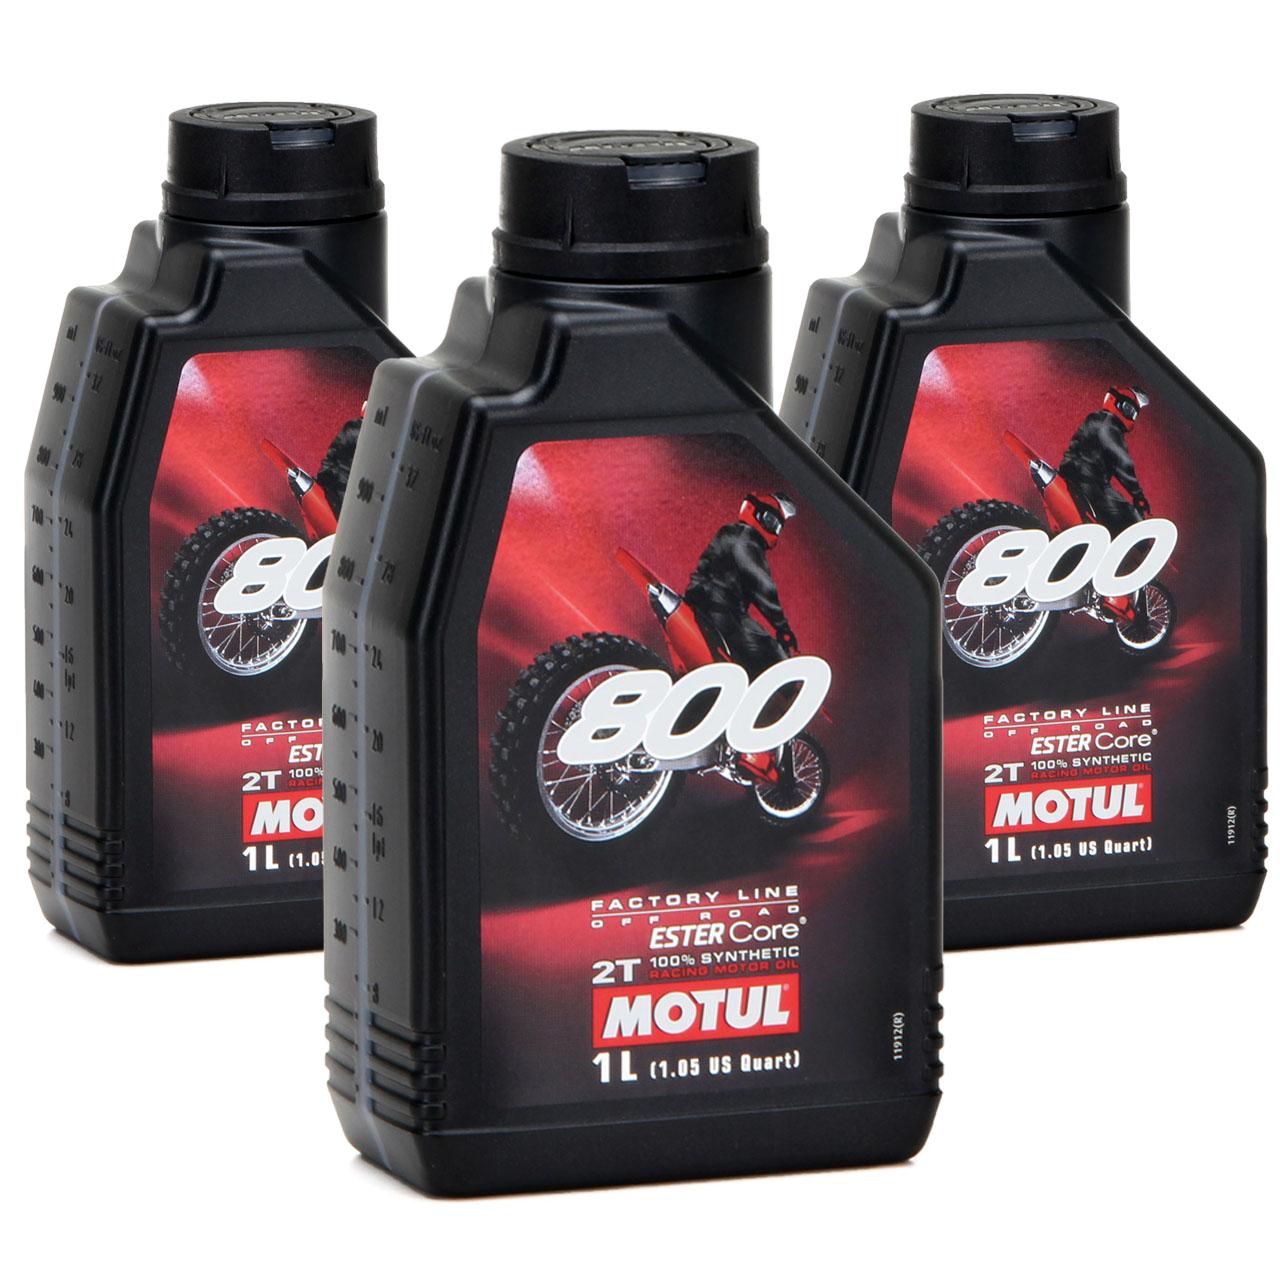 MOTUL 800 2T 2-TAKT Motoröl Öl OFF ROAD Factory Line ESTER Core - 3L 3 Liter